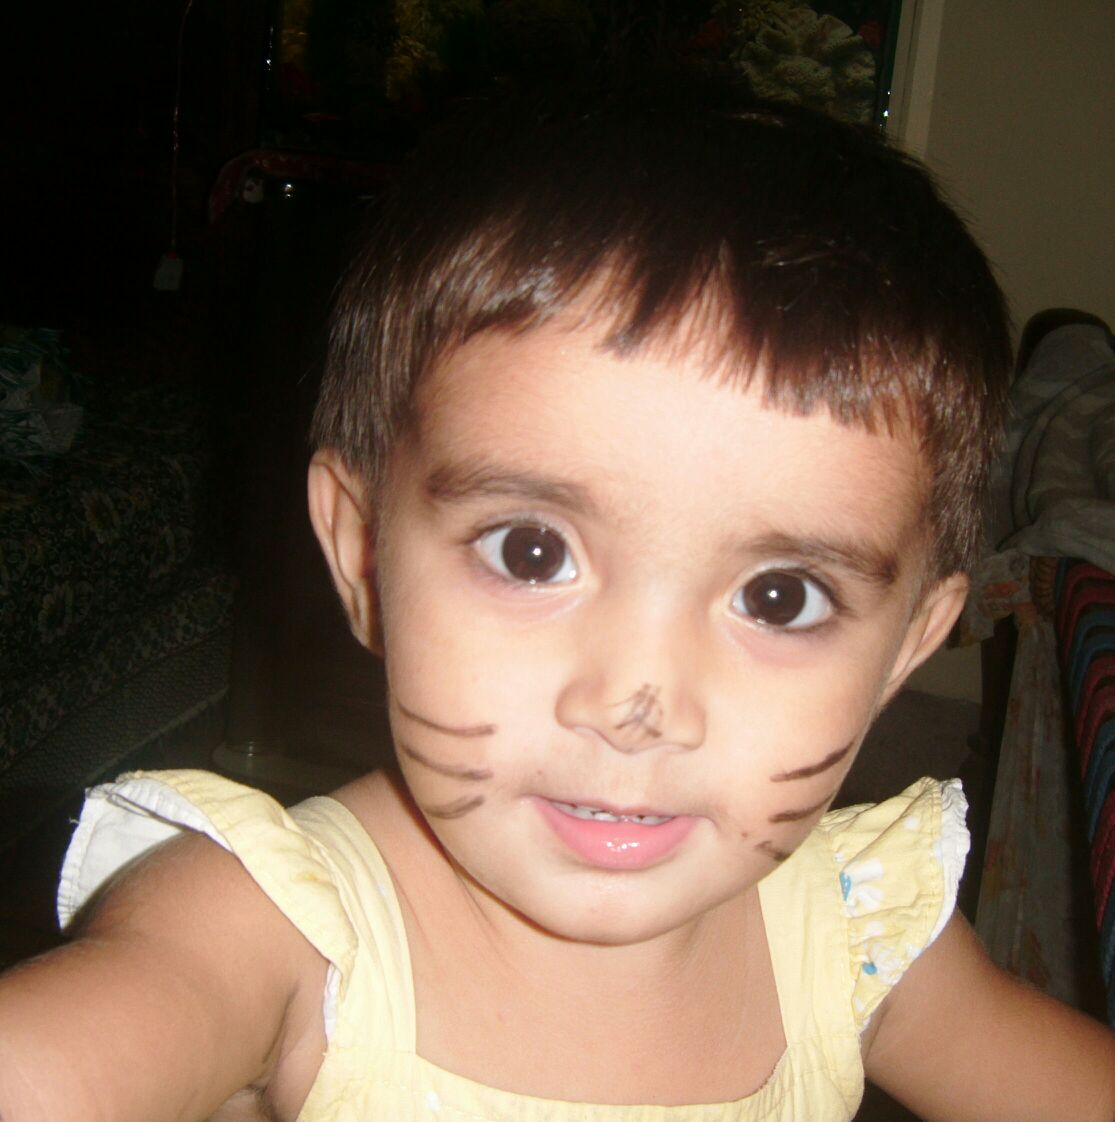 rania saleem - cute girl babies wallpaper pictures photos